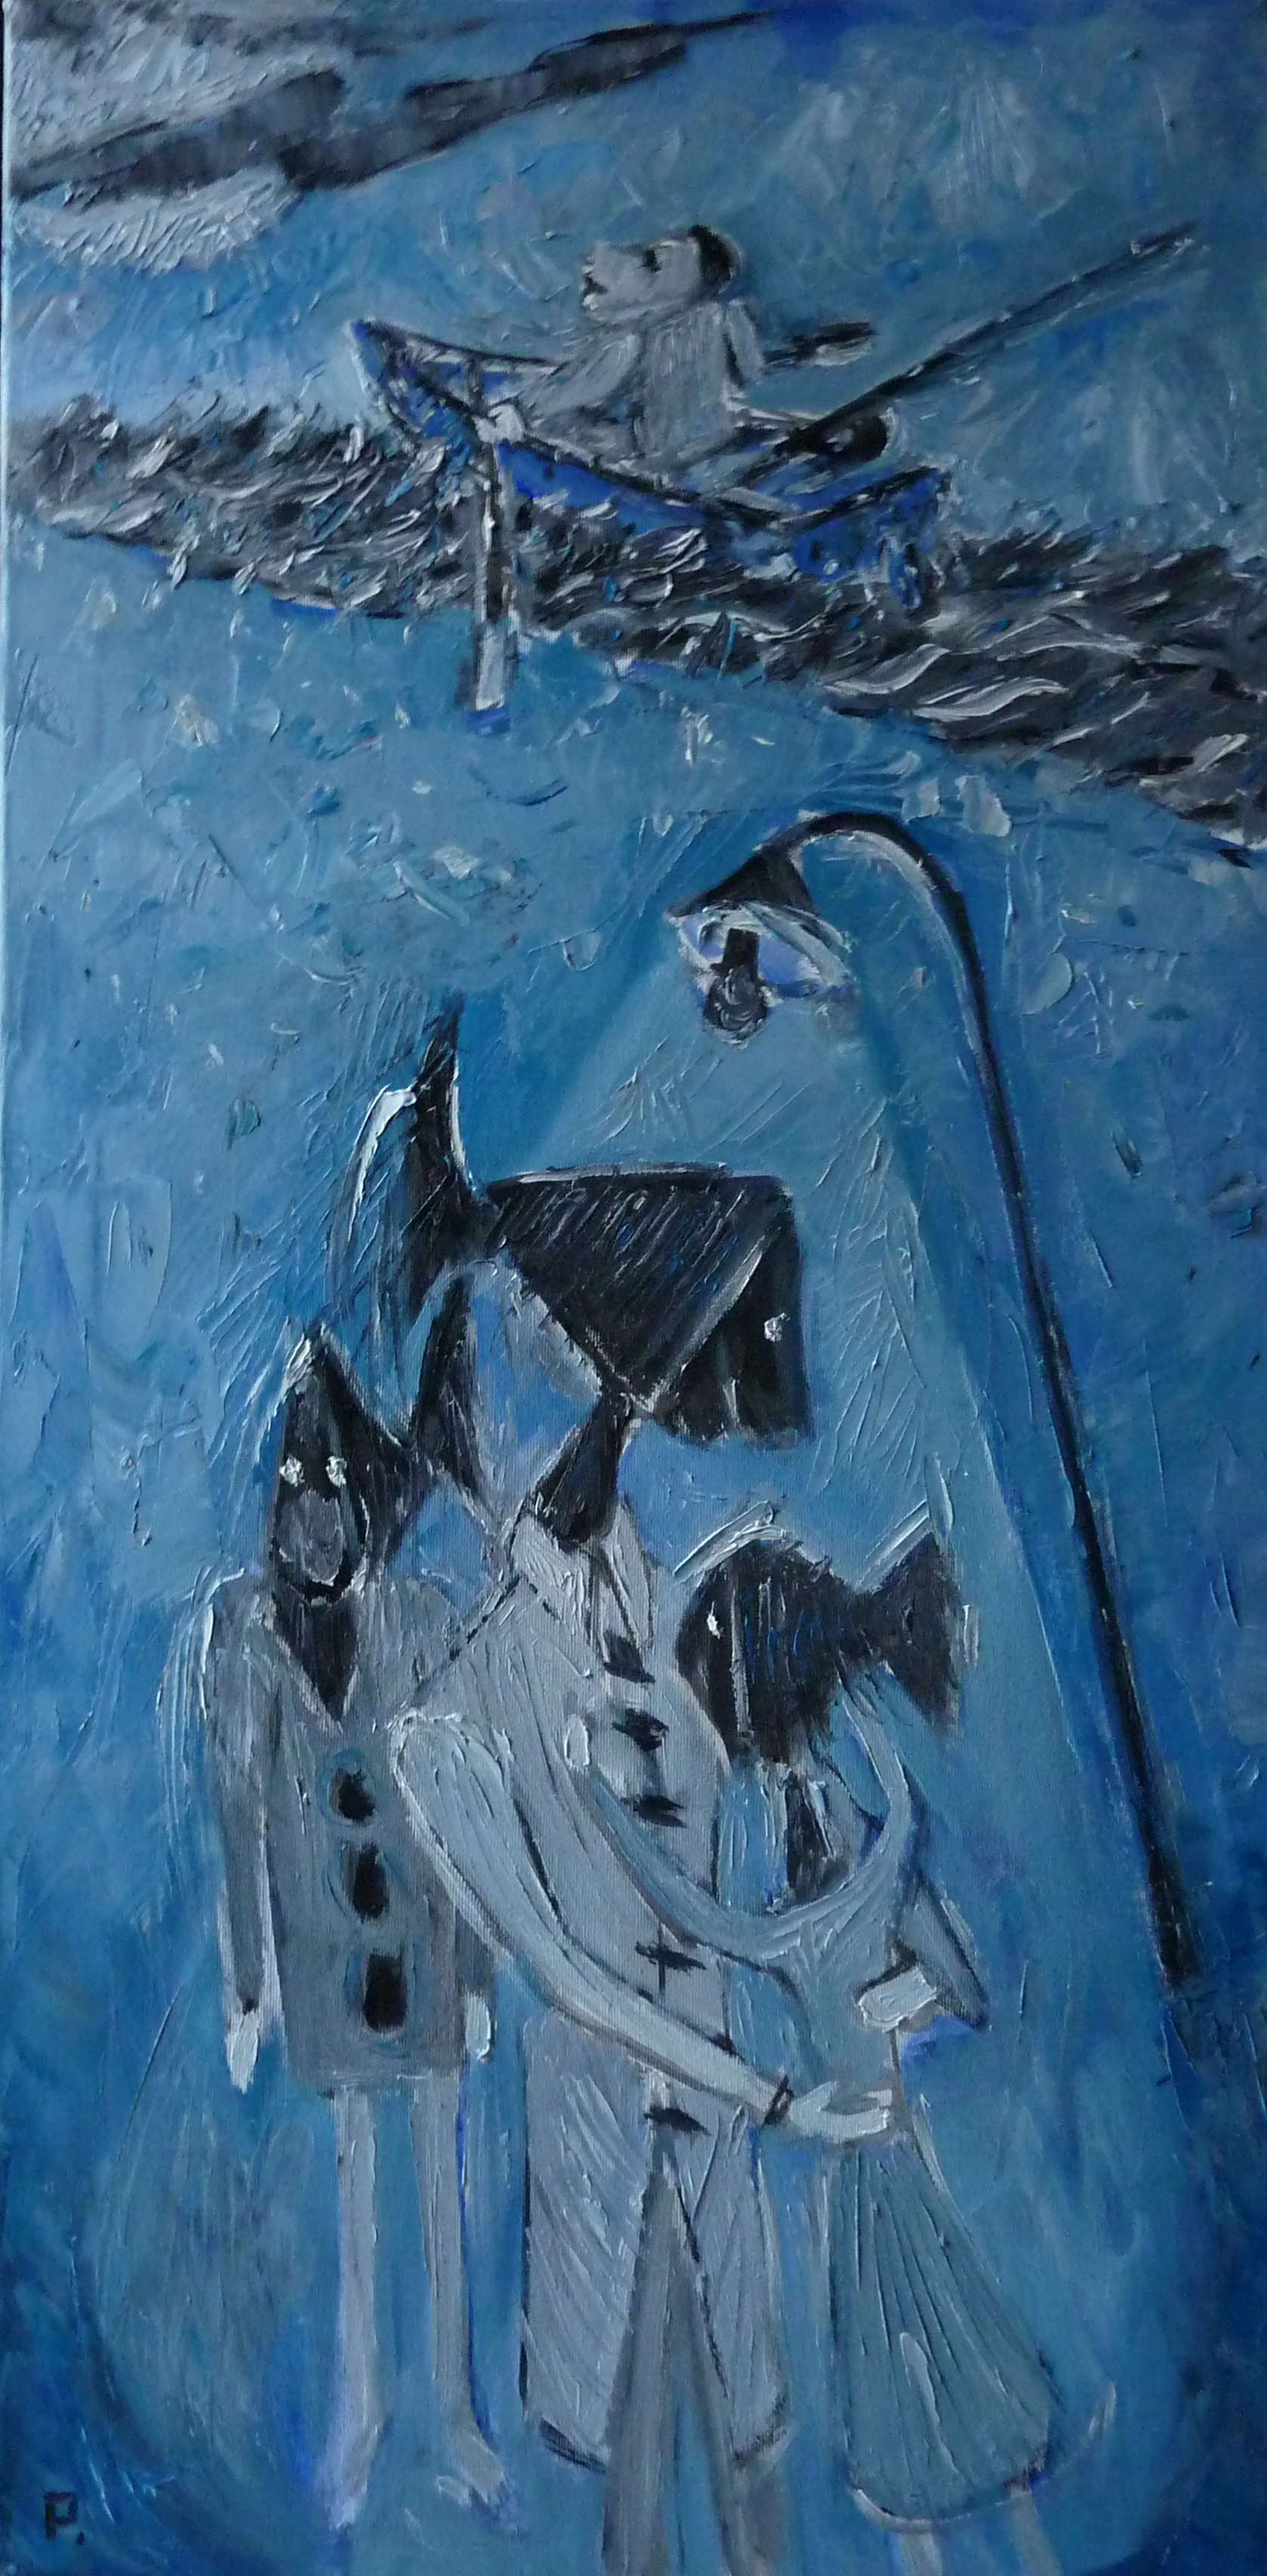 Svyatoslav Ryabkin. Towards the storm